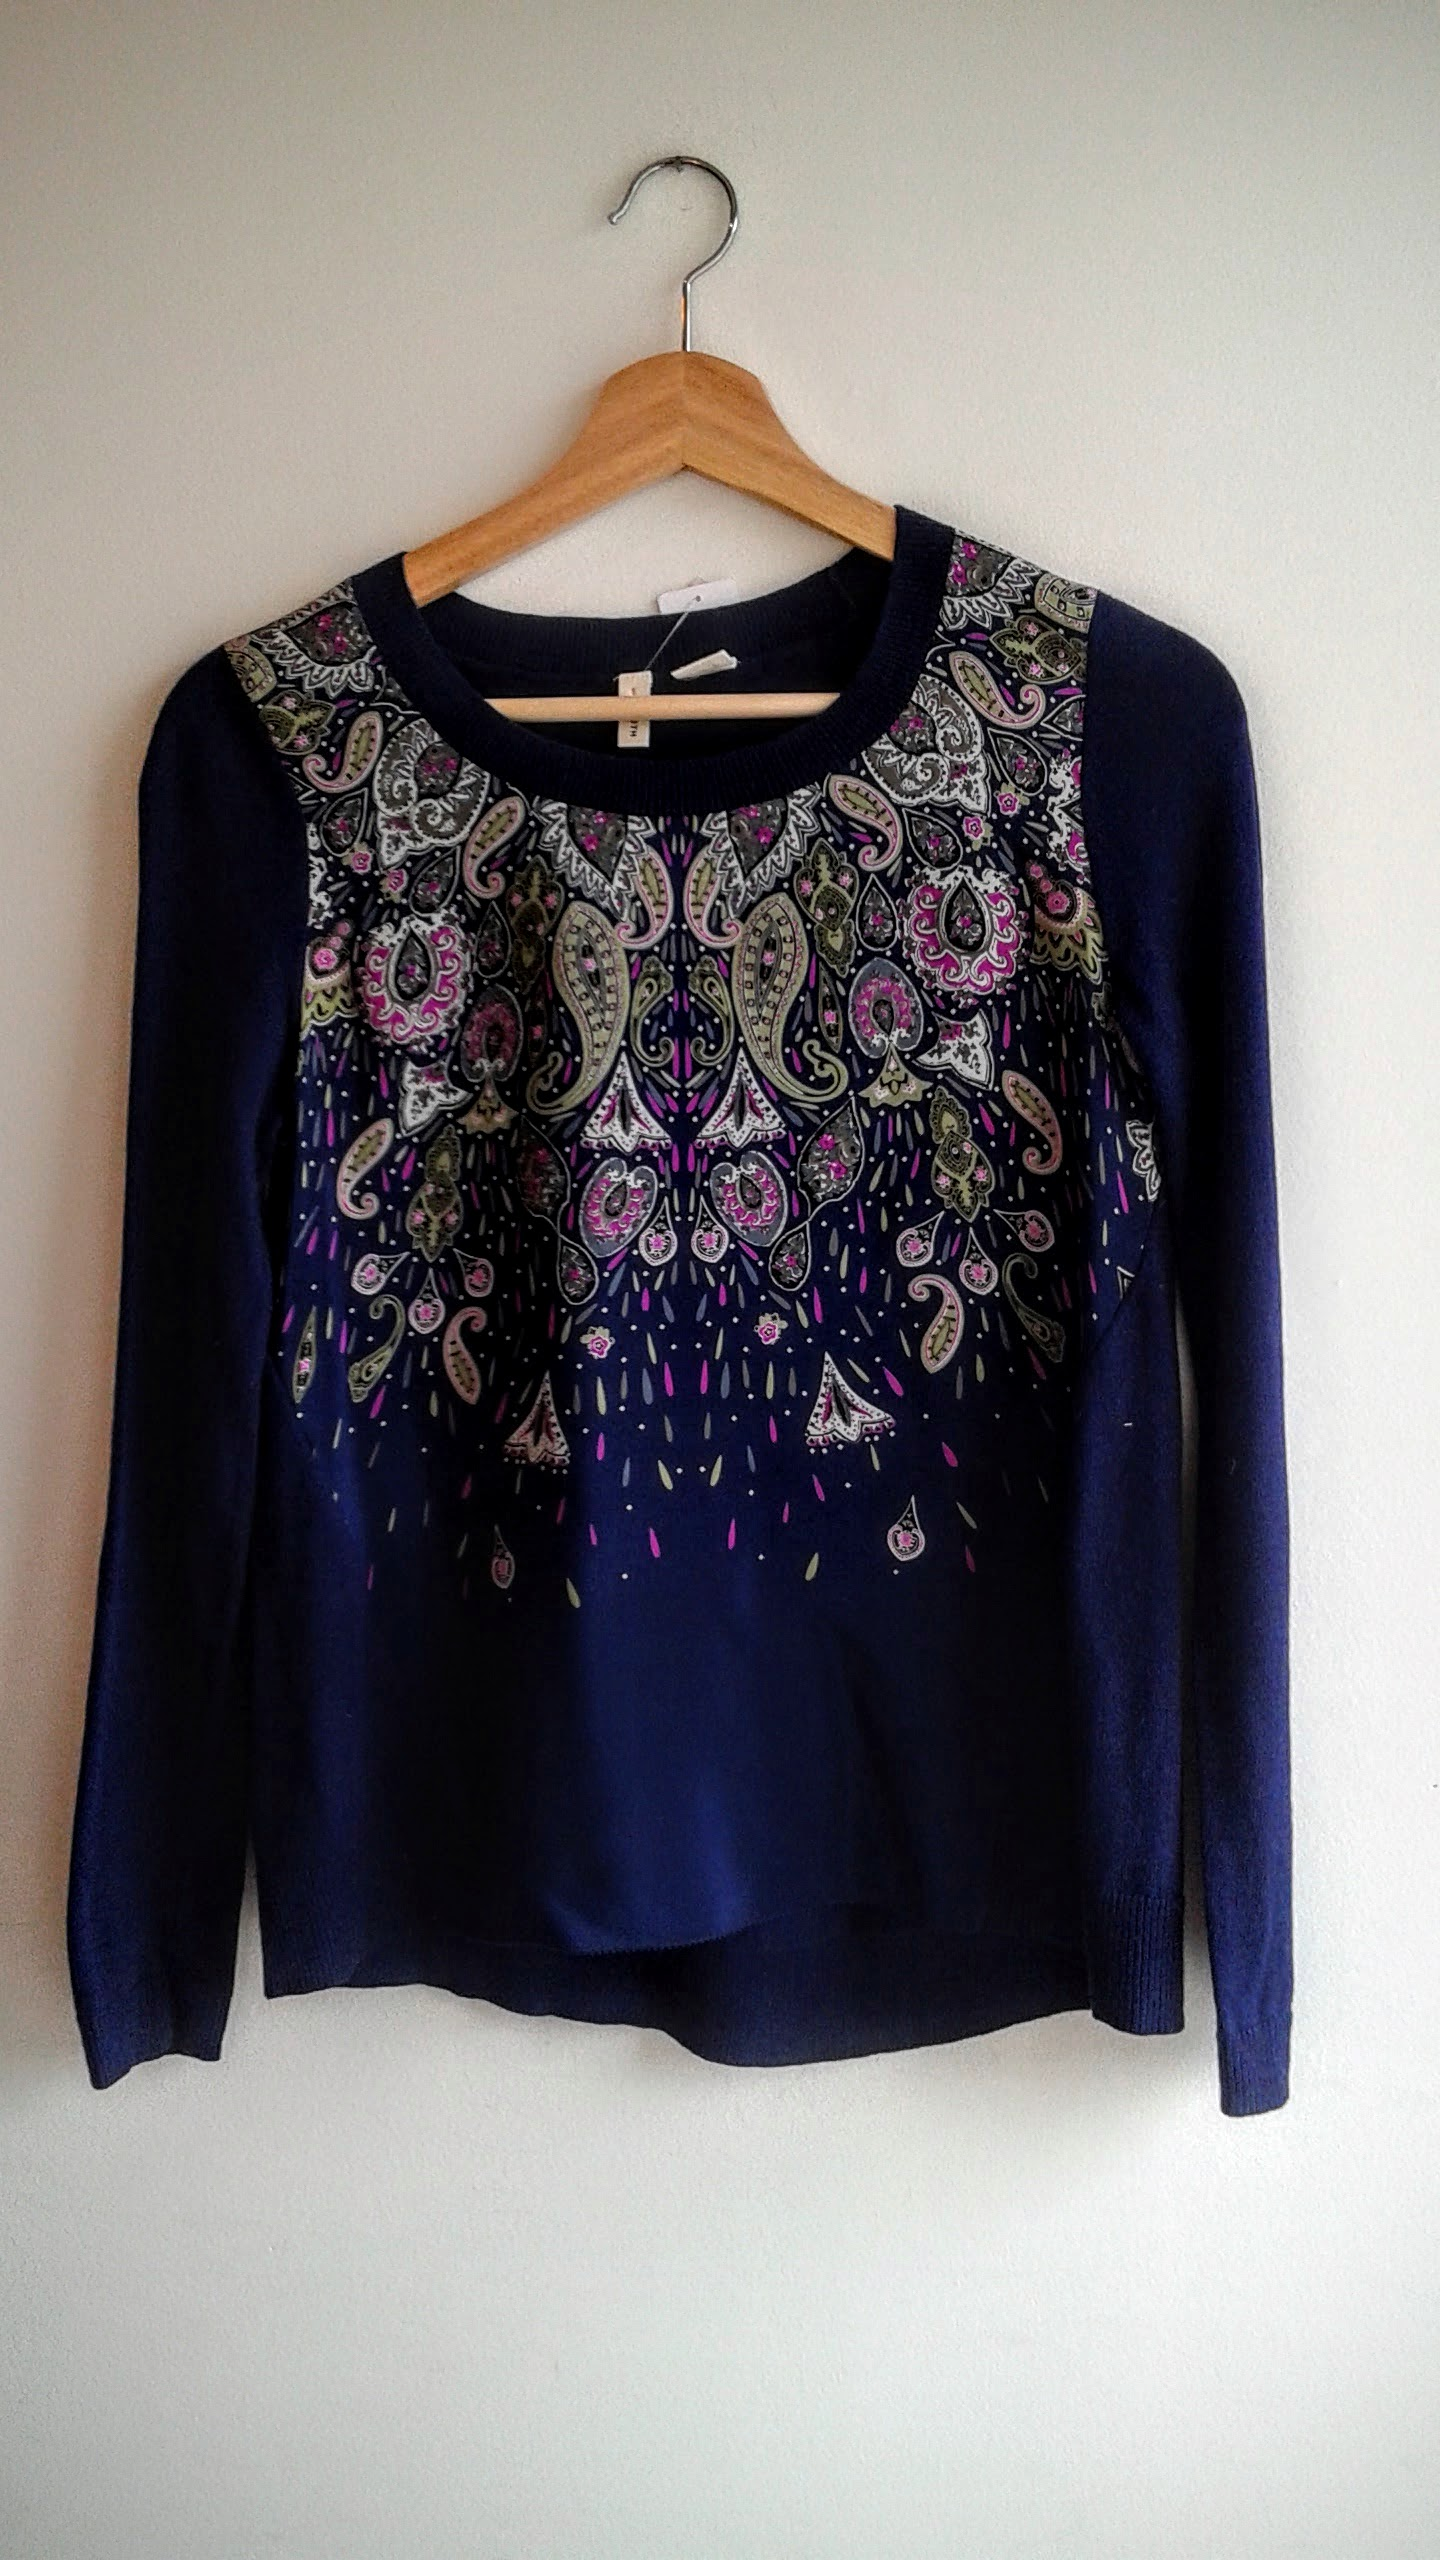 Moth shirt; Size S, $36